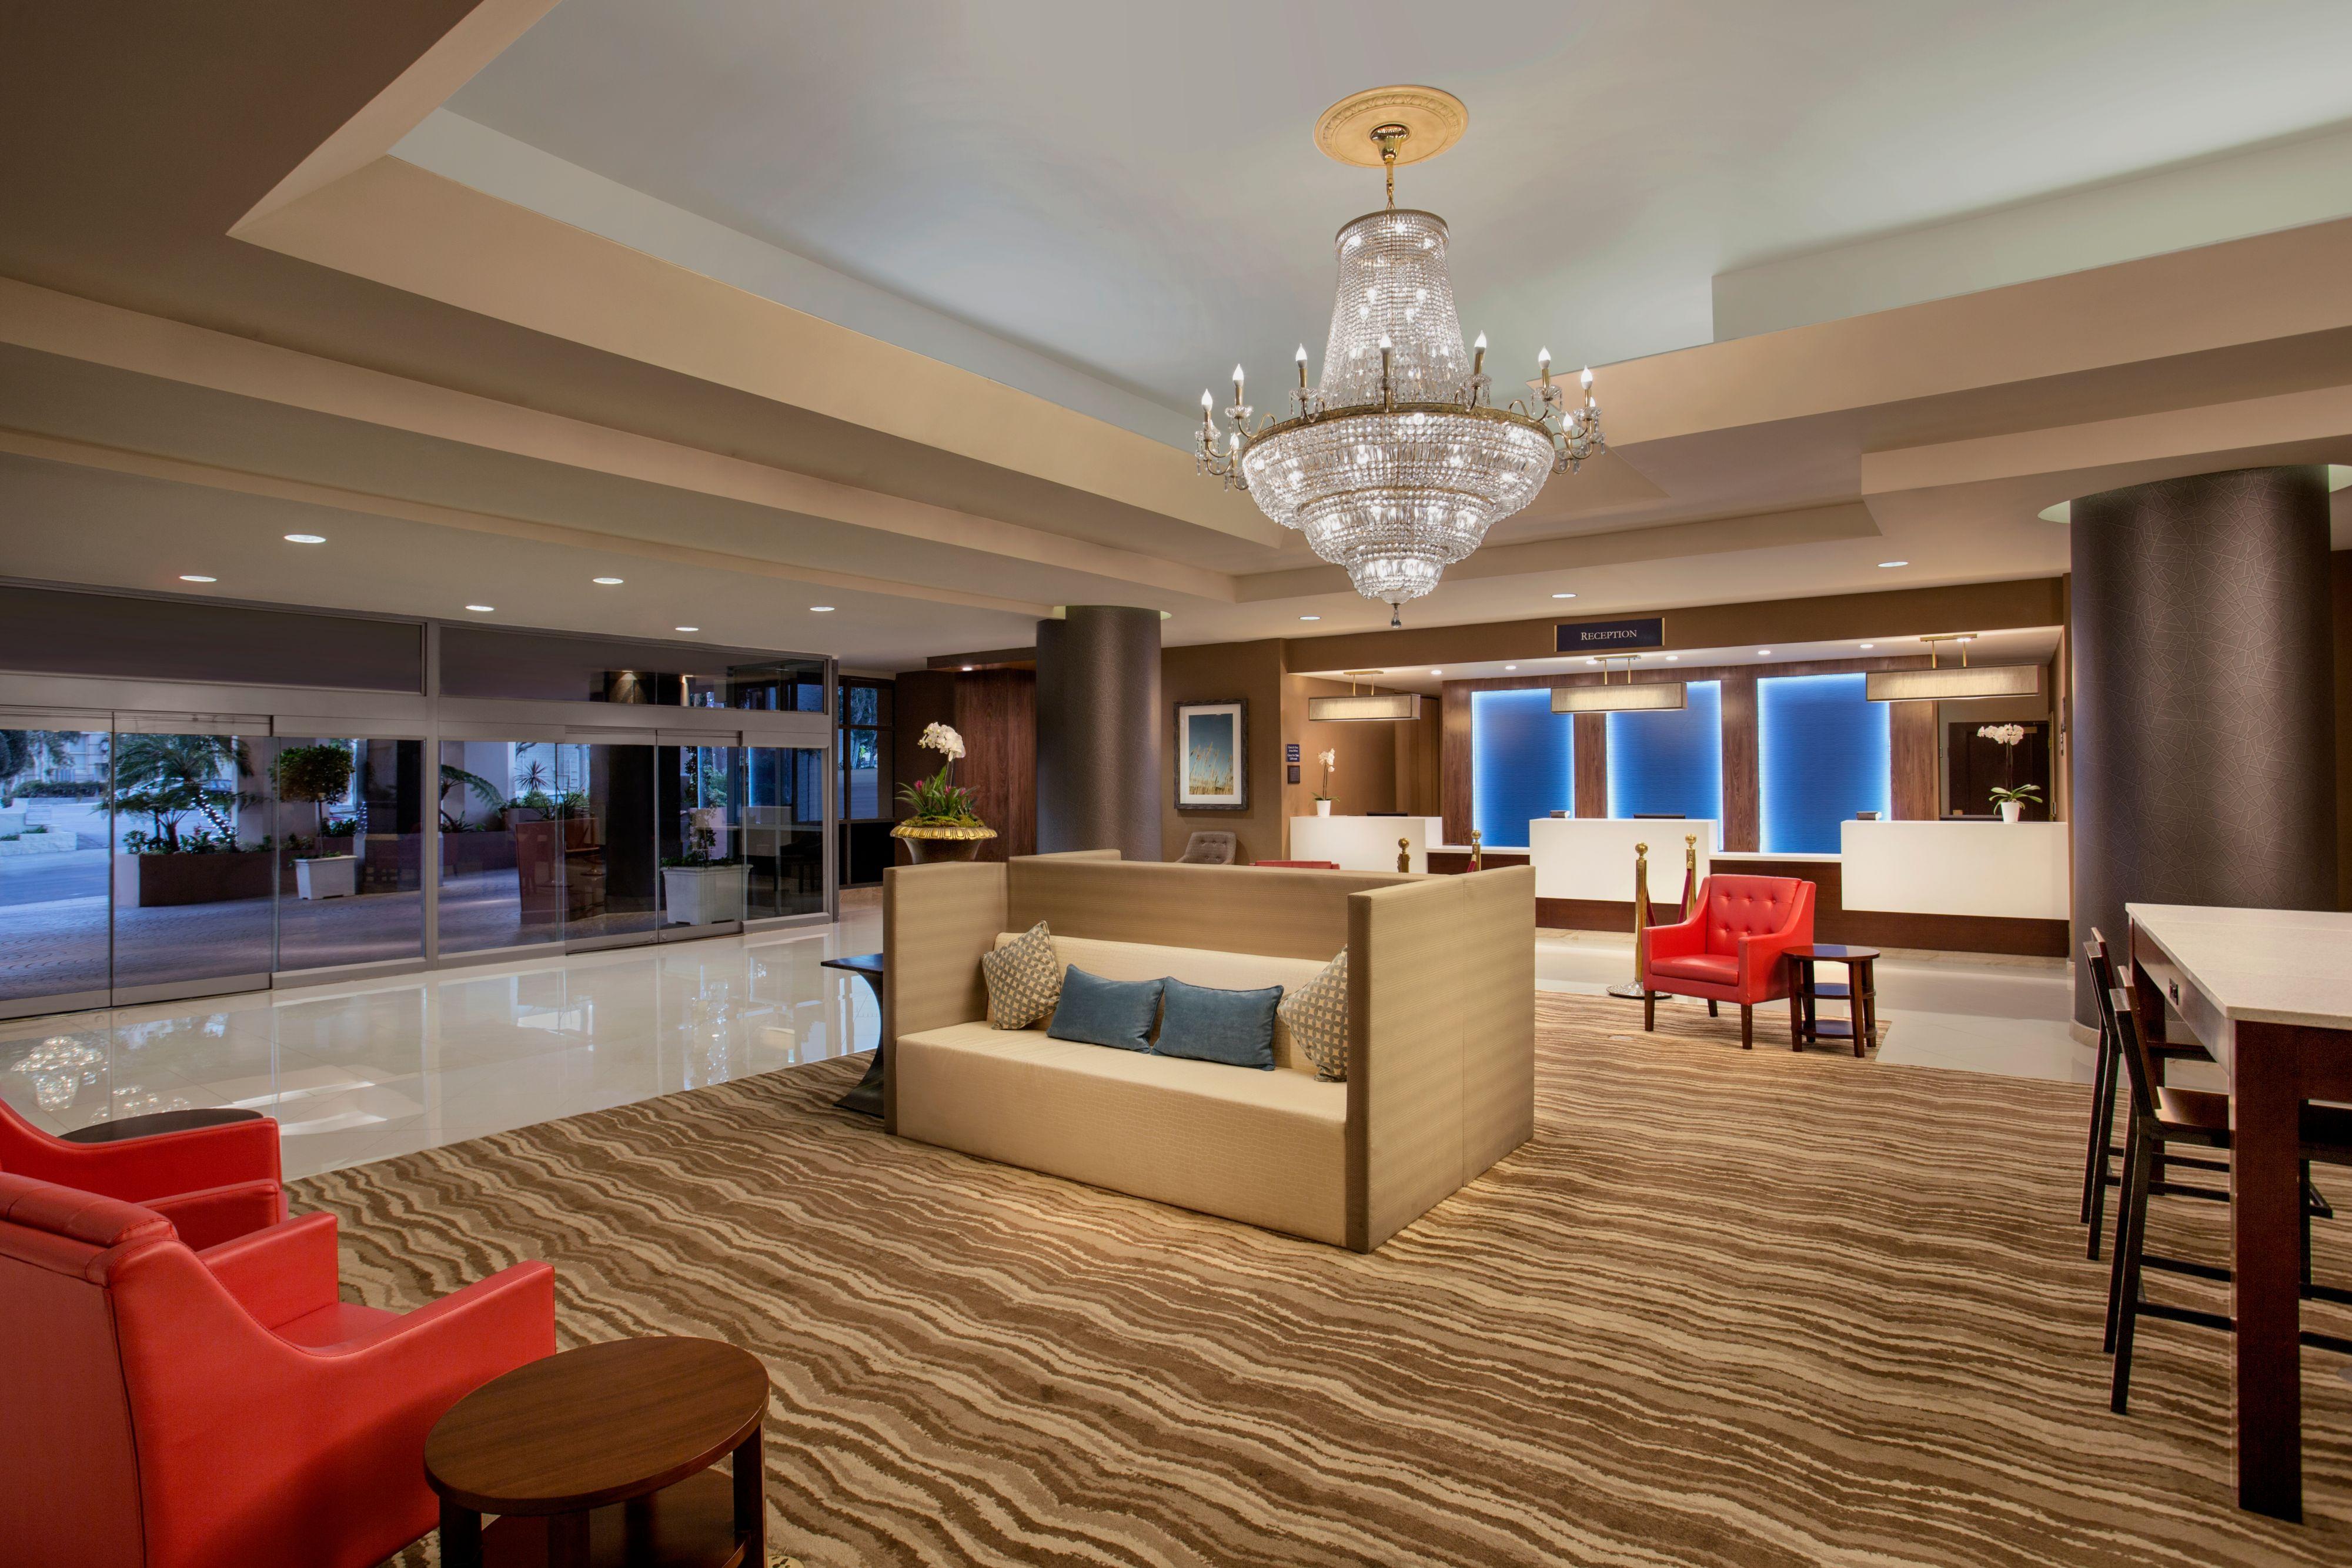 crowne plaza los angeles harbor hotel at 601 s palos. Black Bedroom Furniture Sets. Home Design Ideas